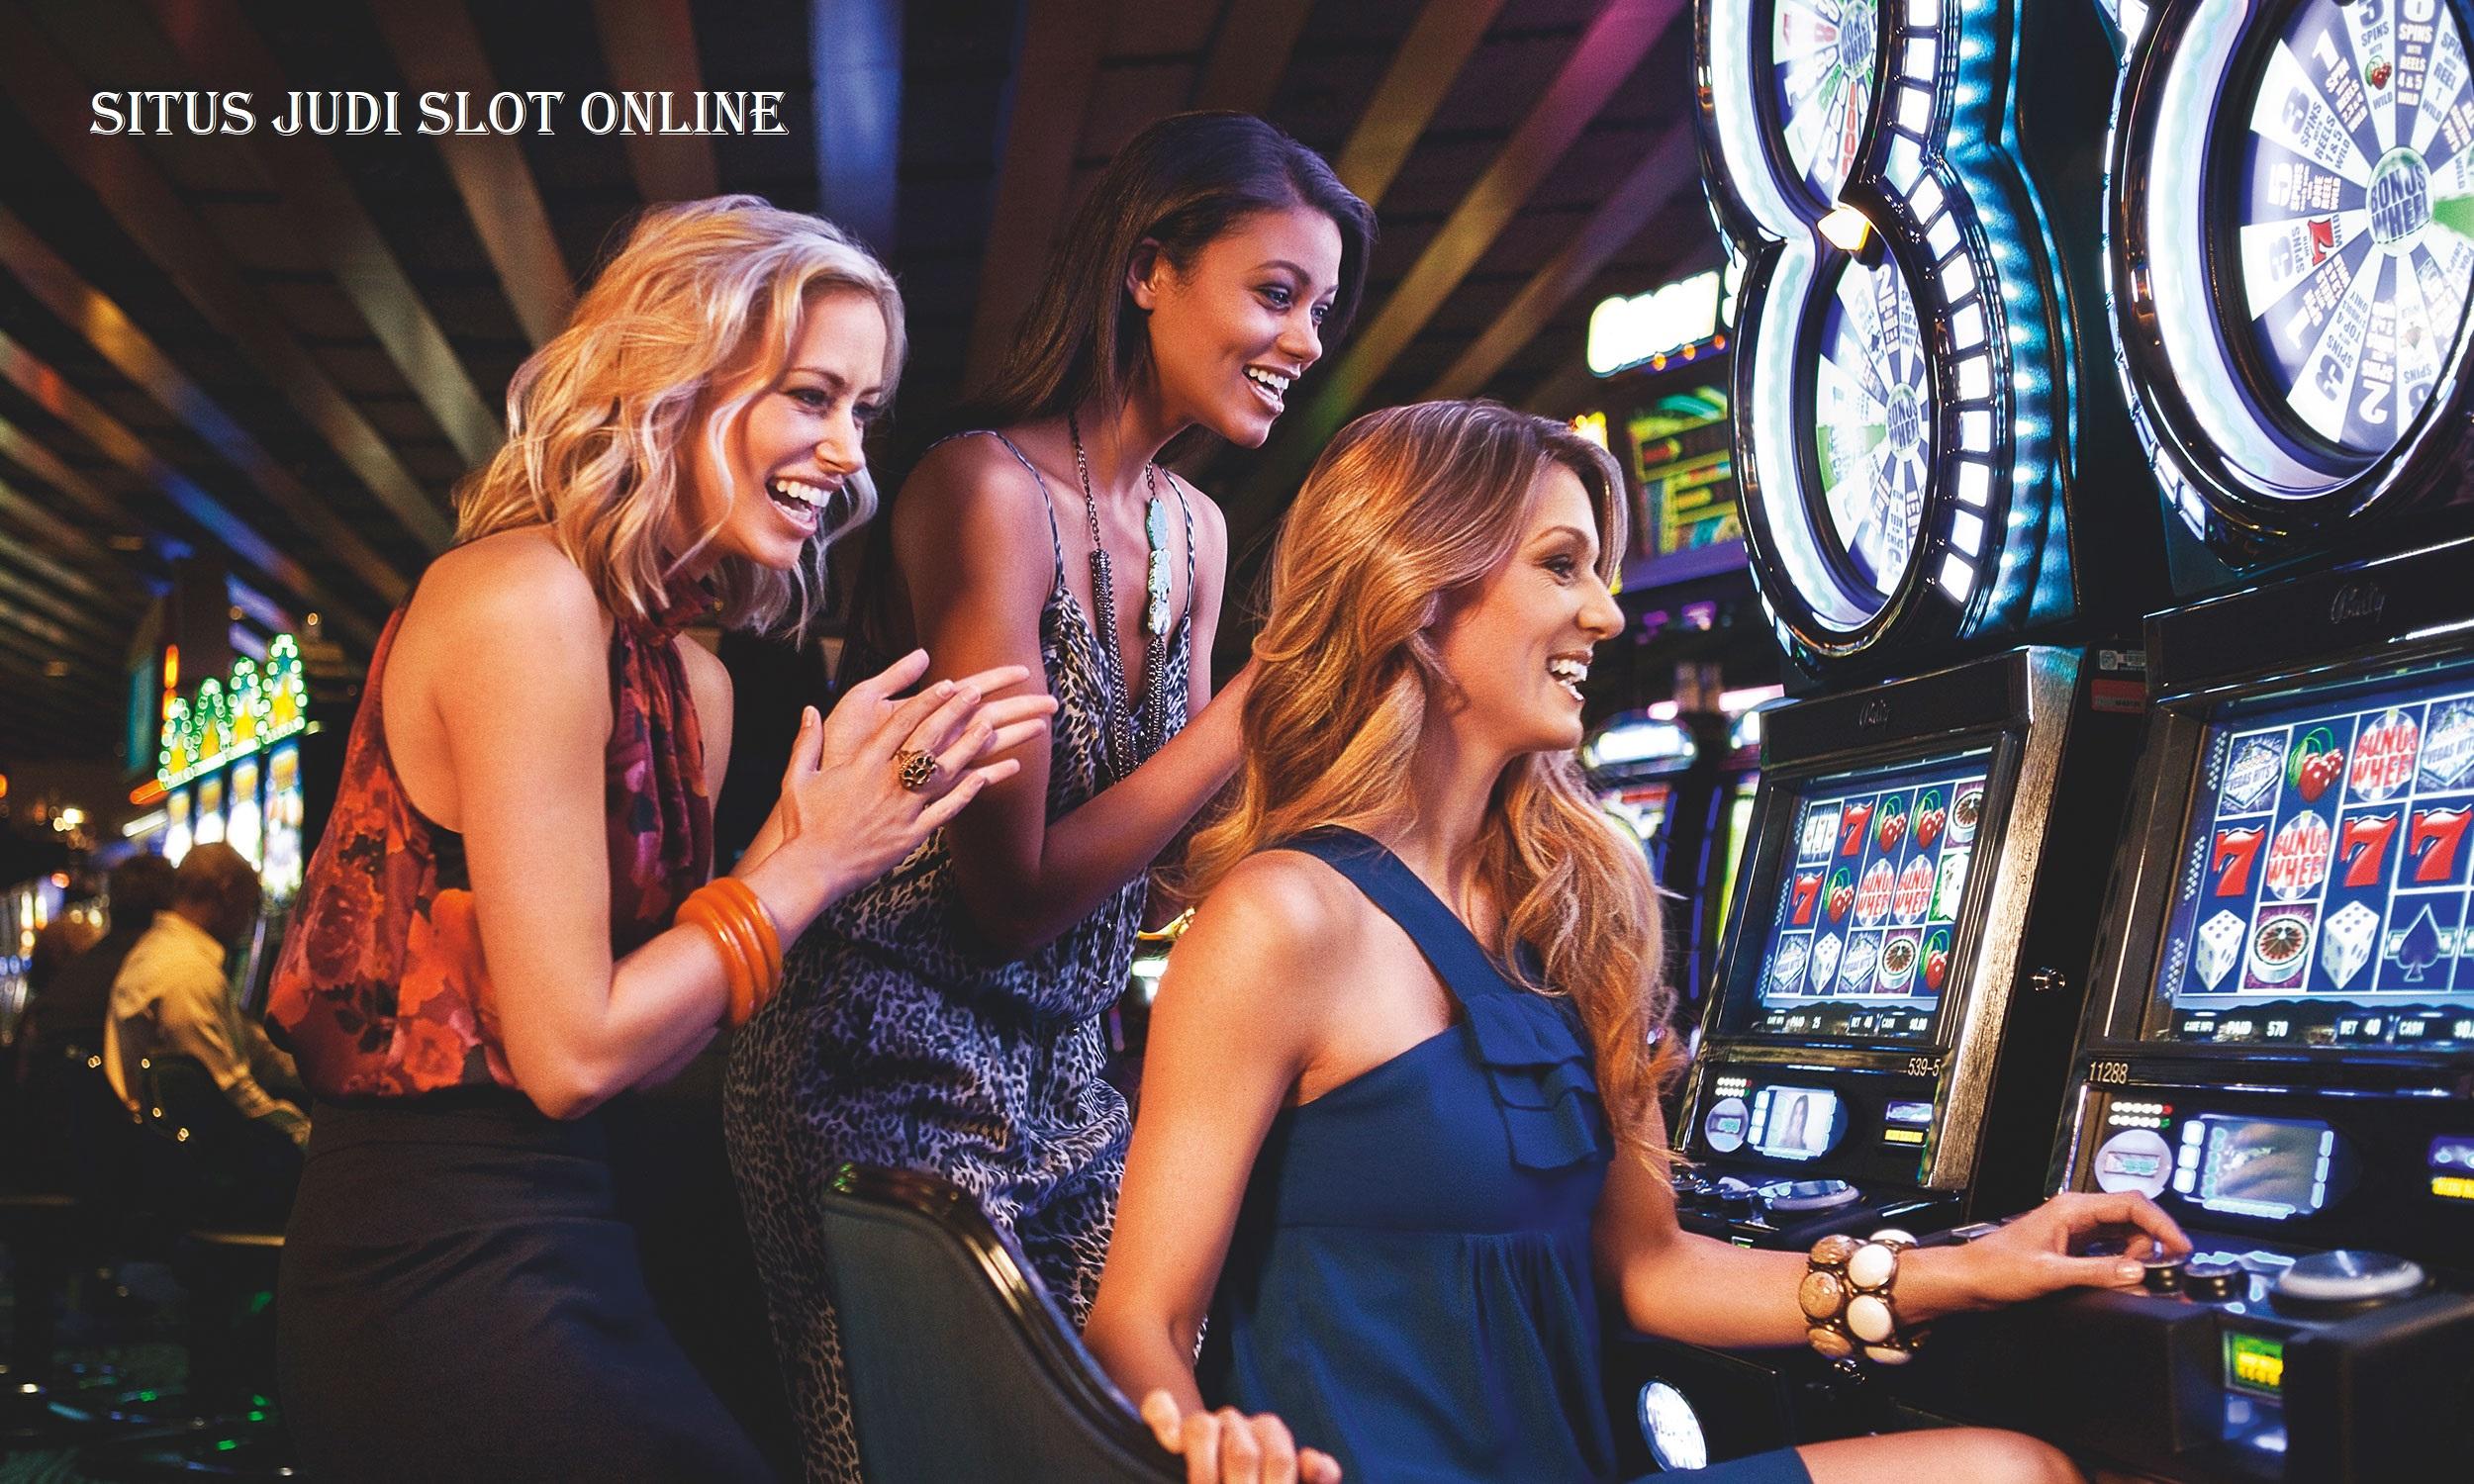 Situs Judi Casino Slot